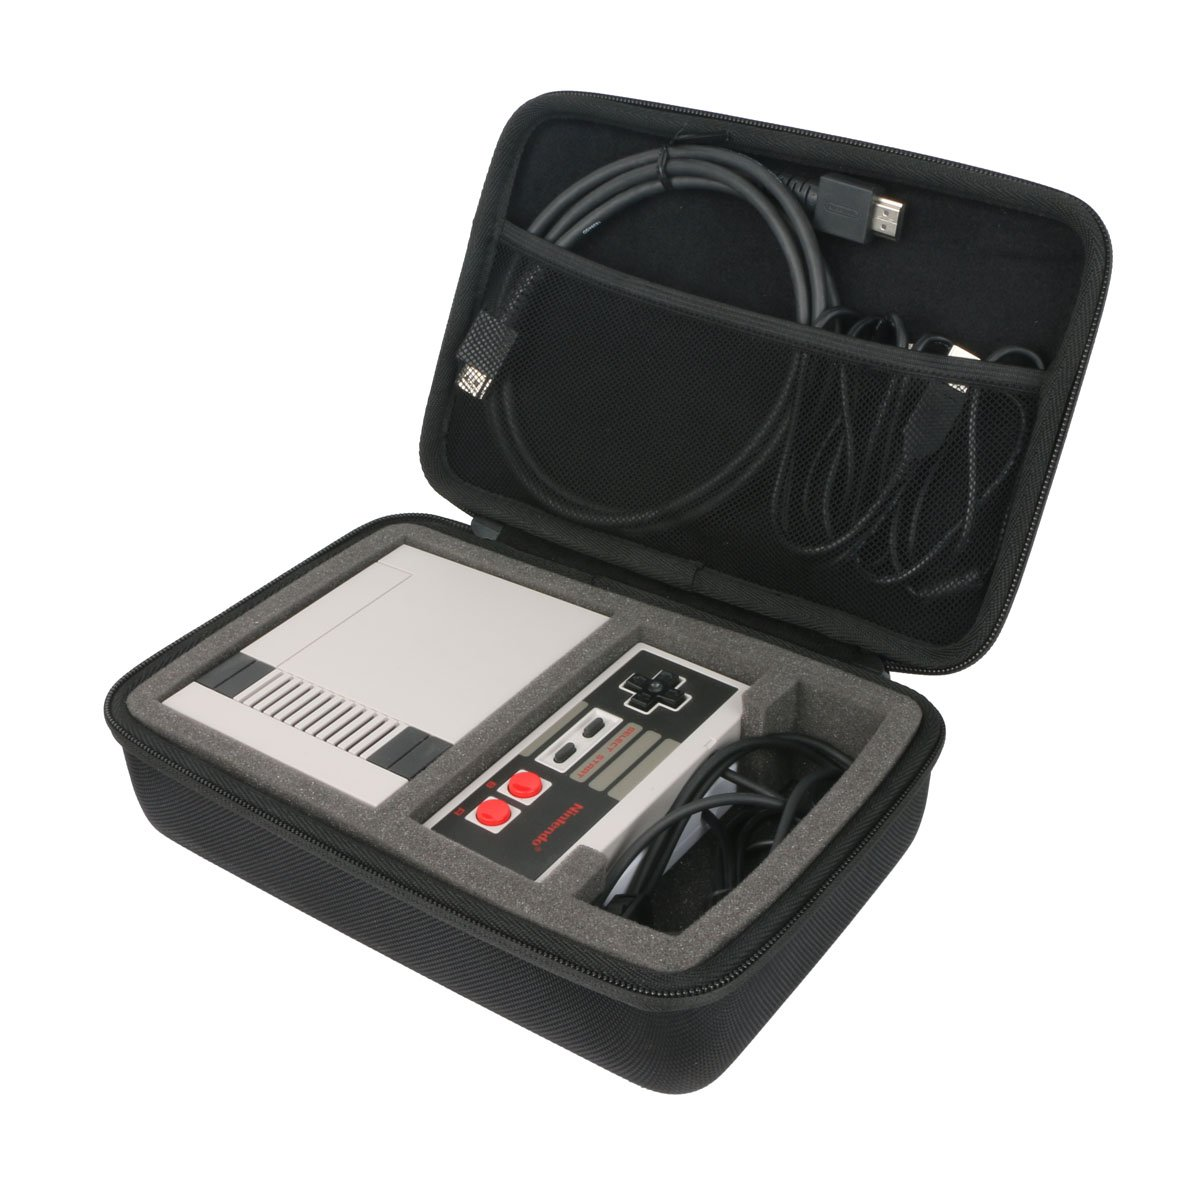 Khanka Hard Case for Nintendo Entertainment System Ortz 10 Feet NES Classic Edition Mini Controller [TURBO EDITION] Rapid Buttons